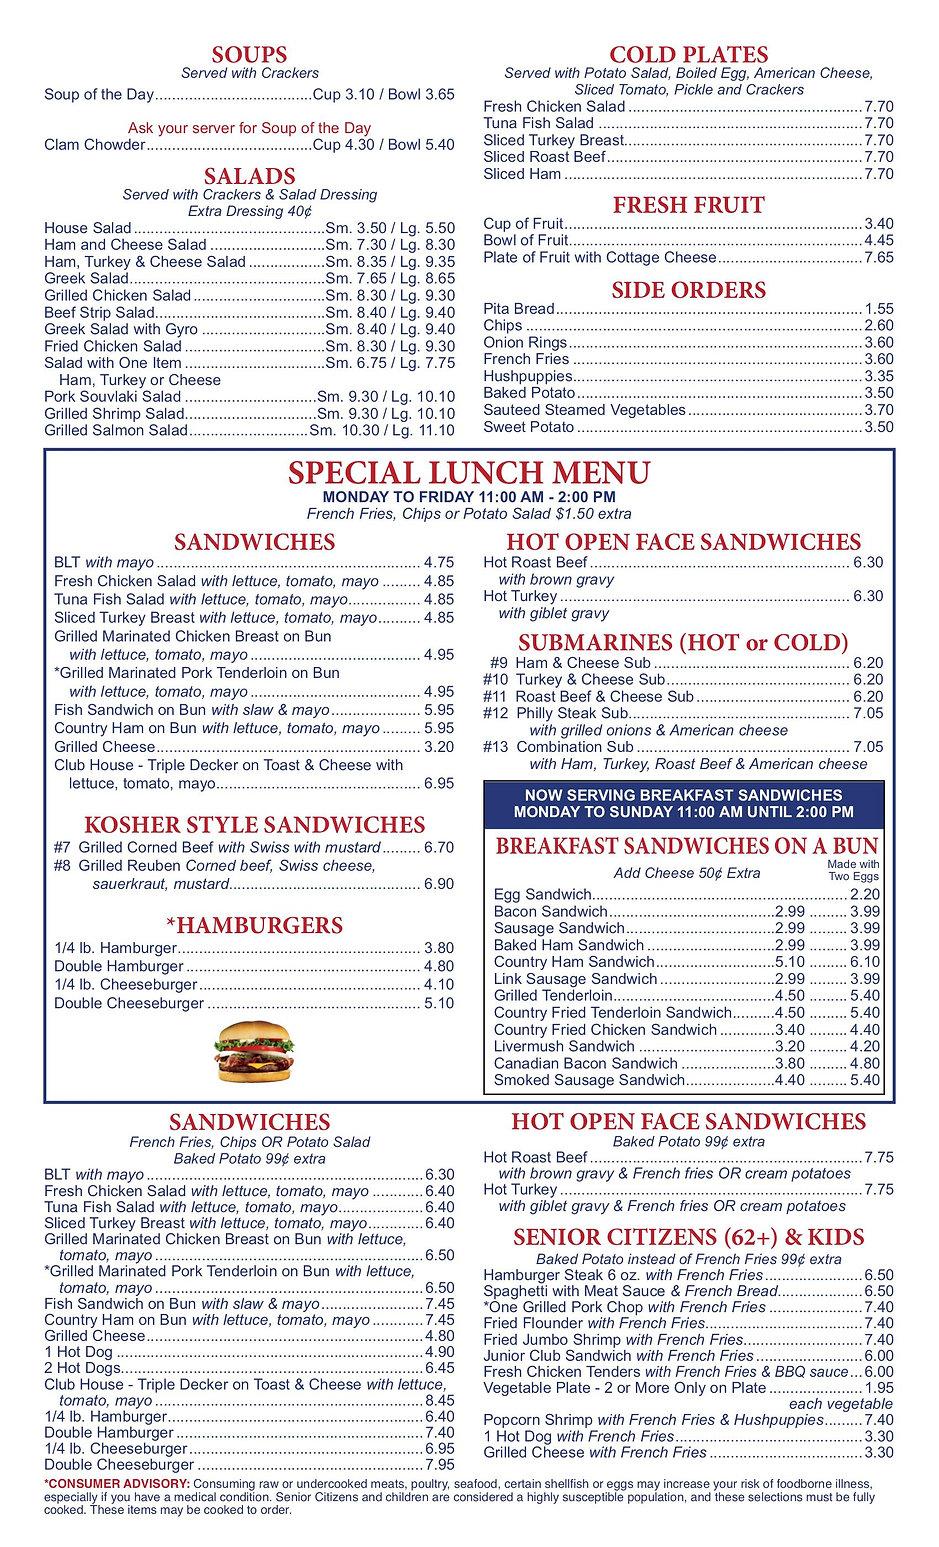 Clemmons Kitchen menu 20212.jpg